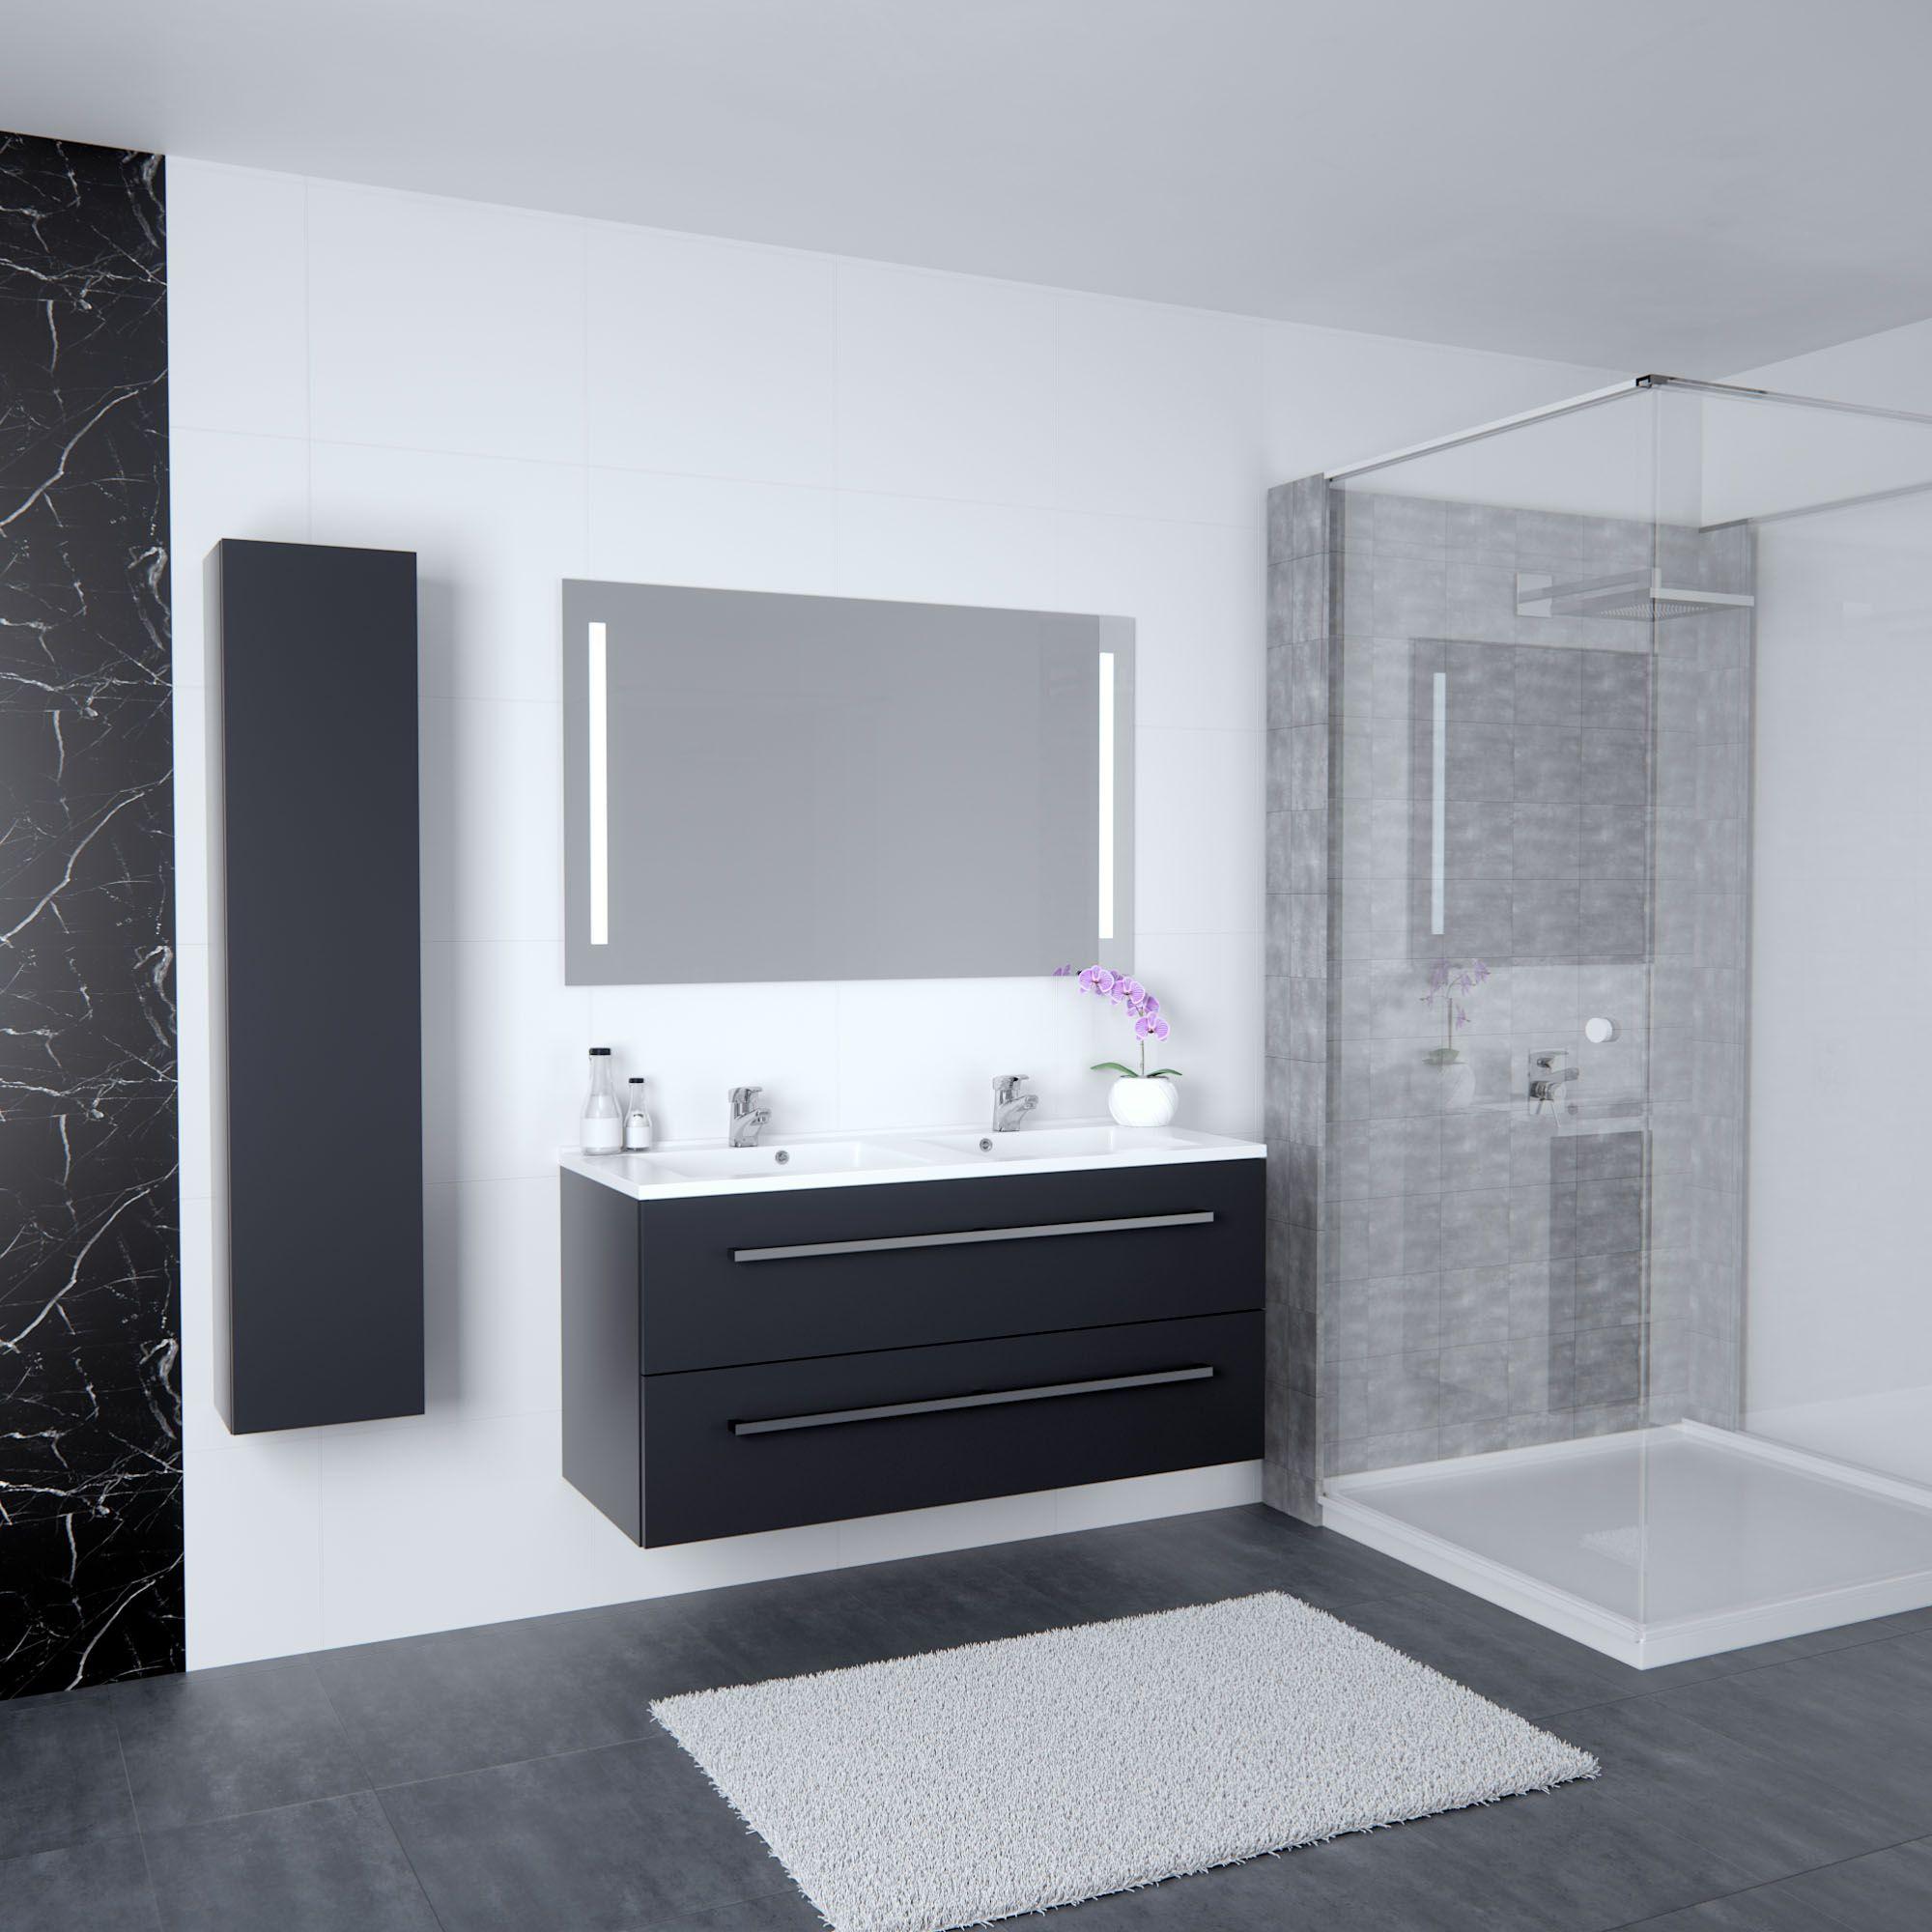 meuble salle de bain haut de gamme mobilier tiroirs grands rangements miroir rtro - Meuble Salle De Bain Haut De Gamme